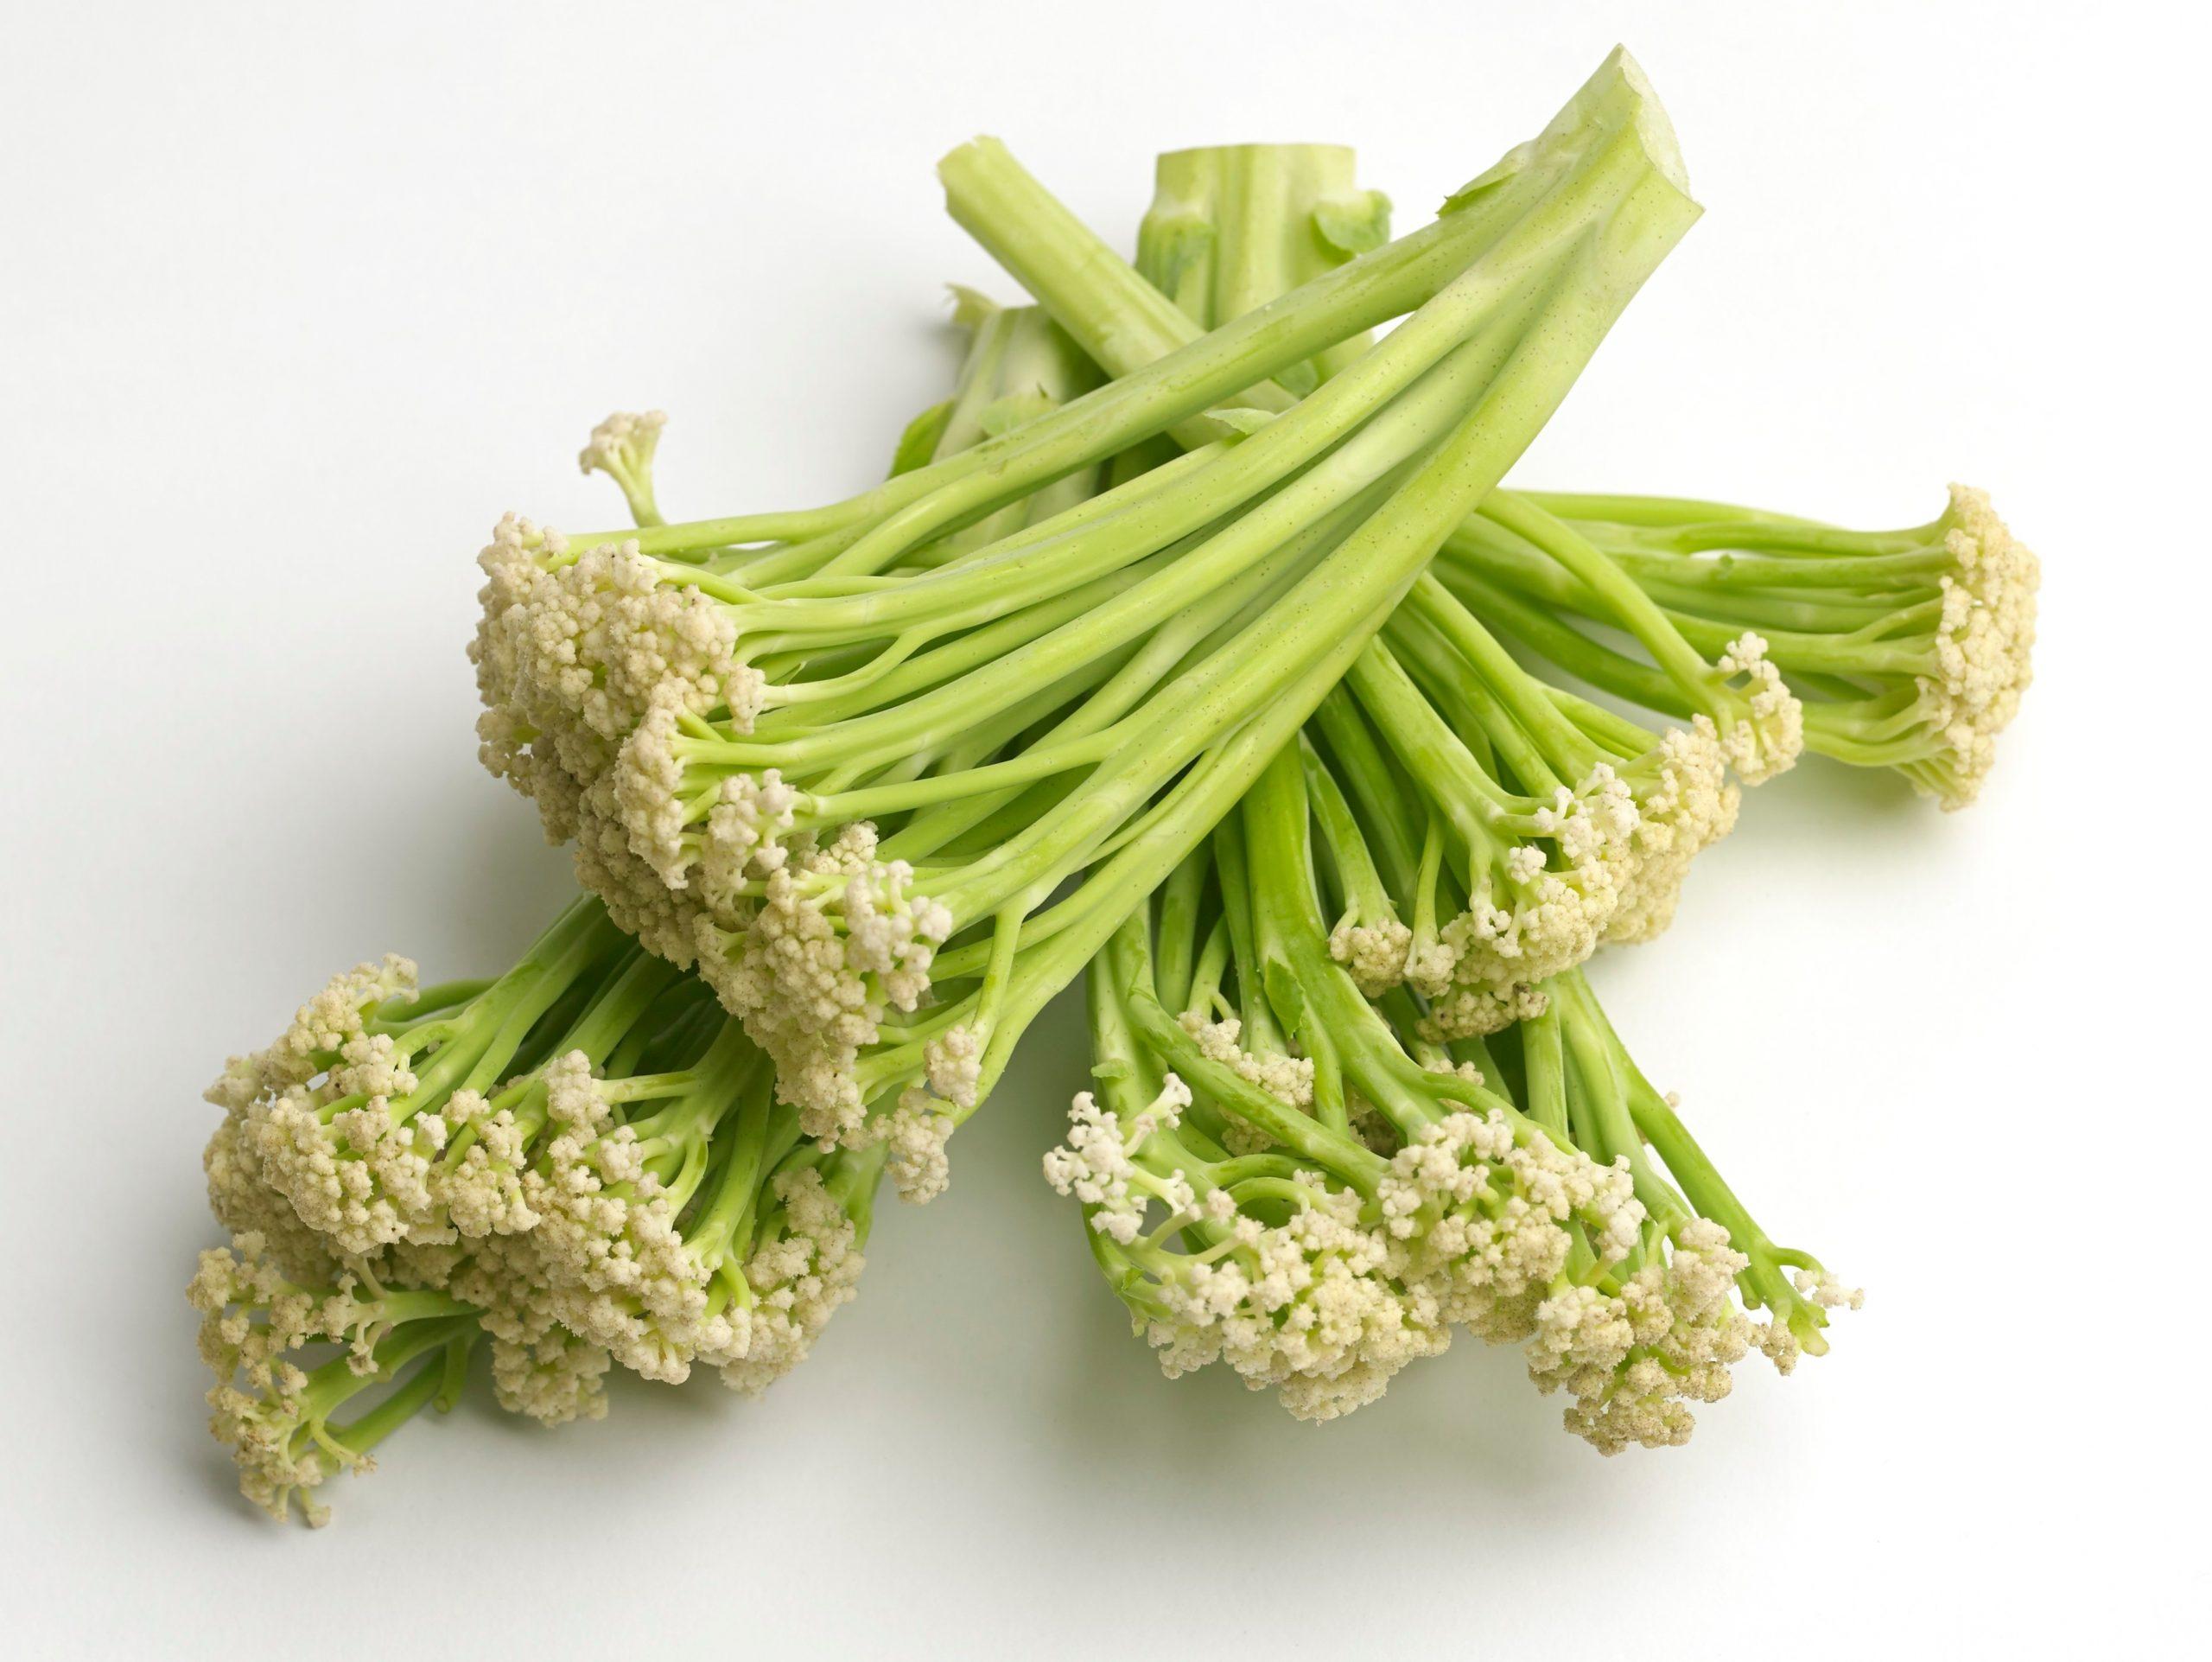 In hopes of widening cauliflower'sappeal, UK supermarket chainWaitrose has introduceda new, versatilelong stemmed version calledSweet Sprouting Cauliflower.